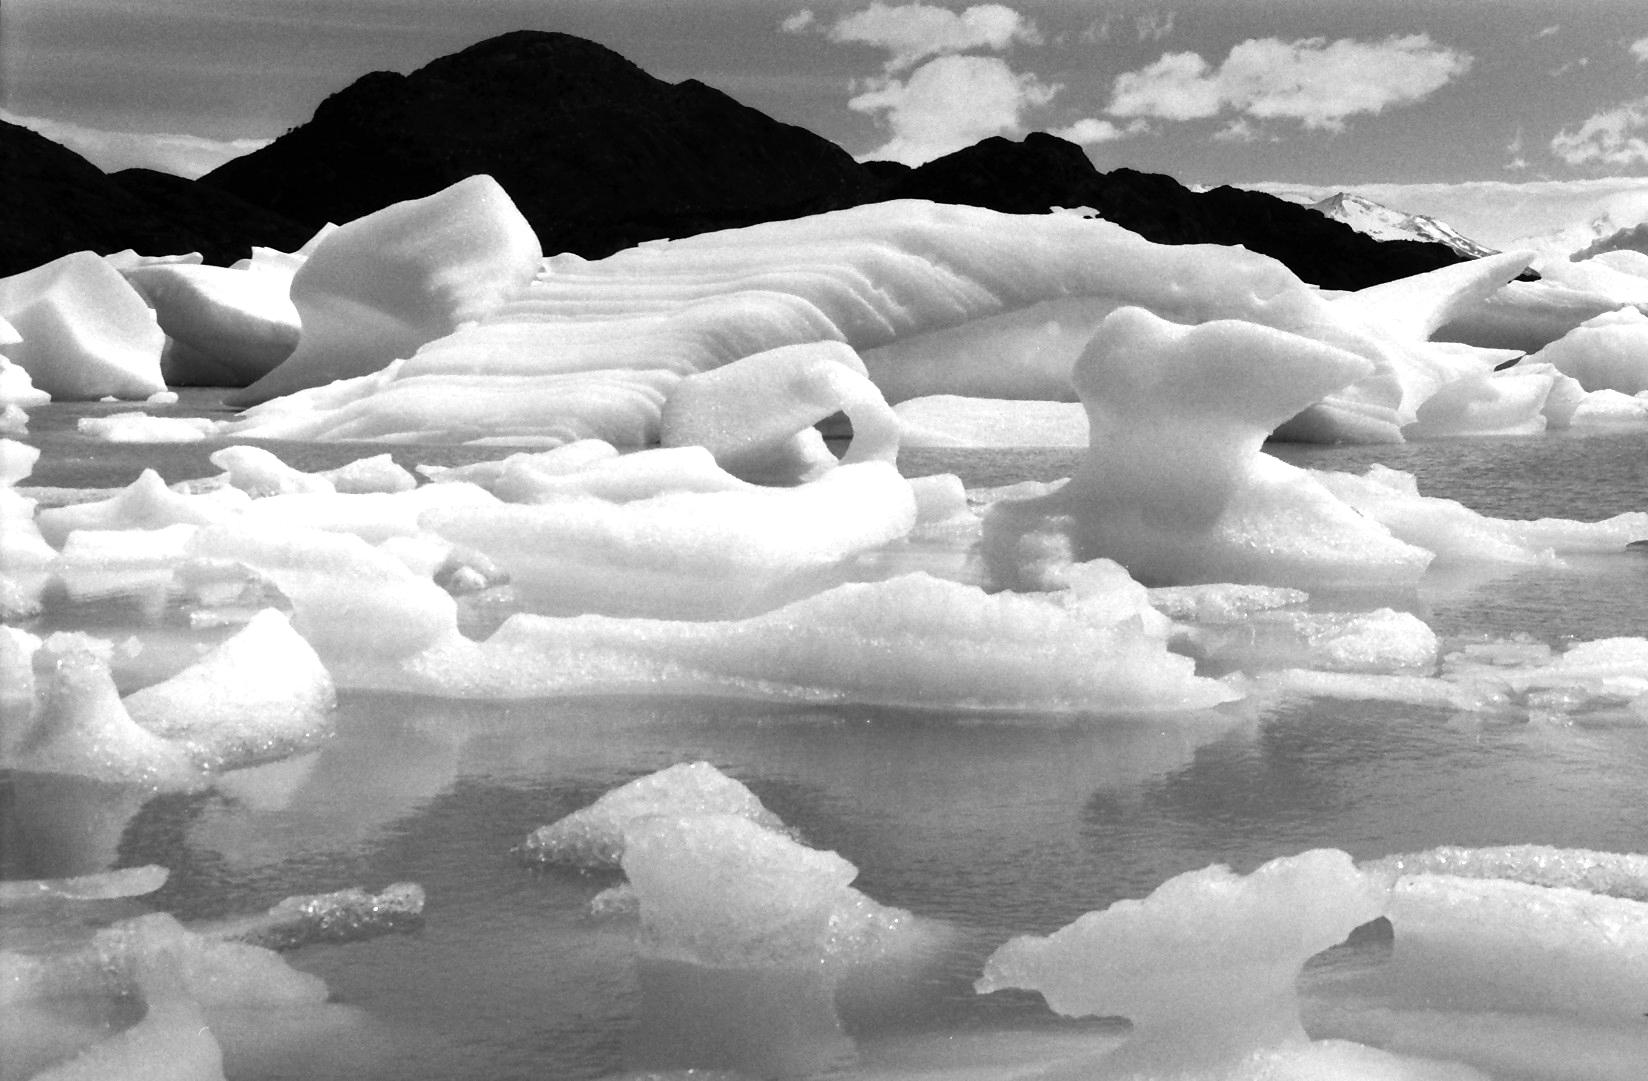 Glaciar Grey - Torres del Paine - Chilean Patagonia